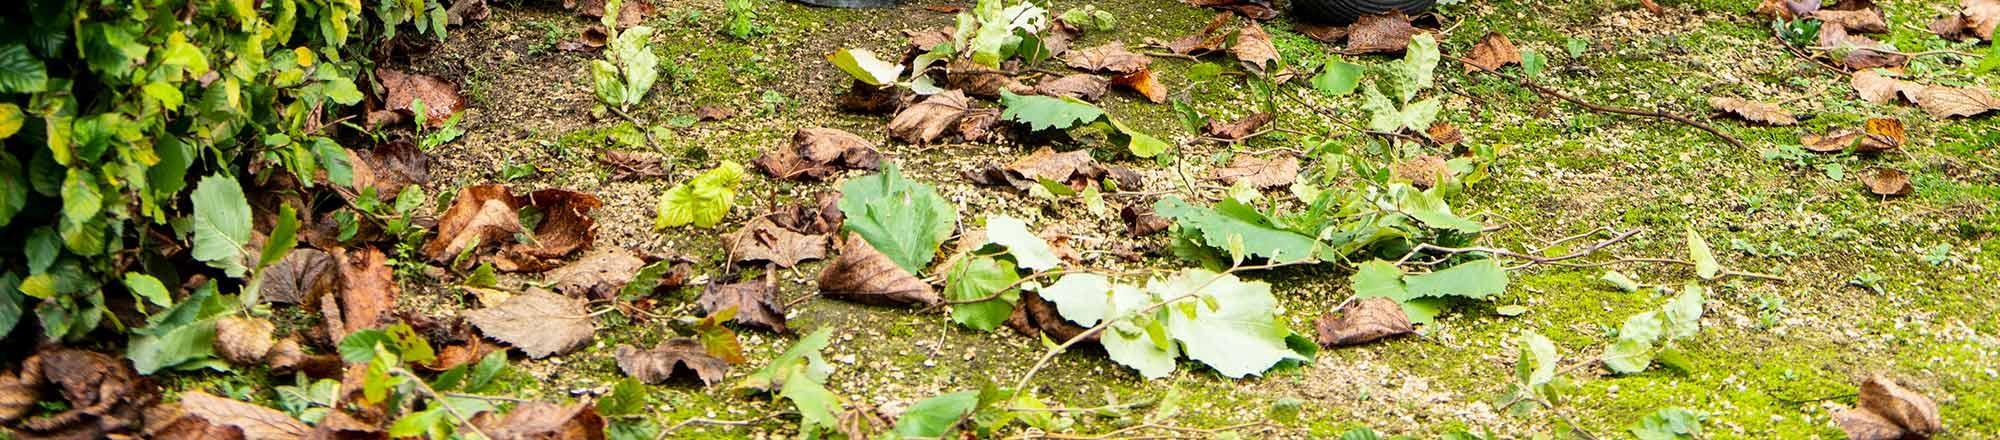 Mulch: Waarom een mulchlaag en zelf mulchen